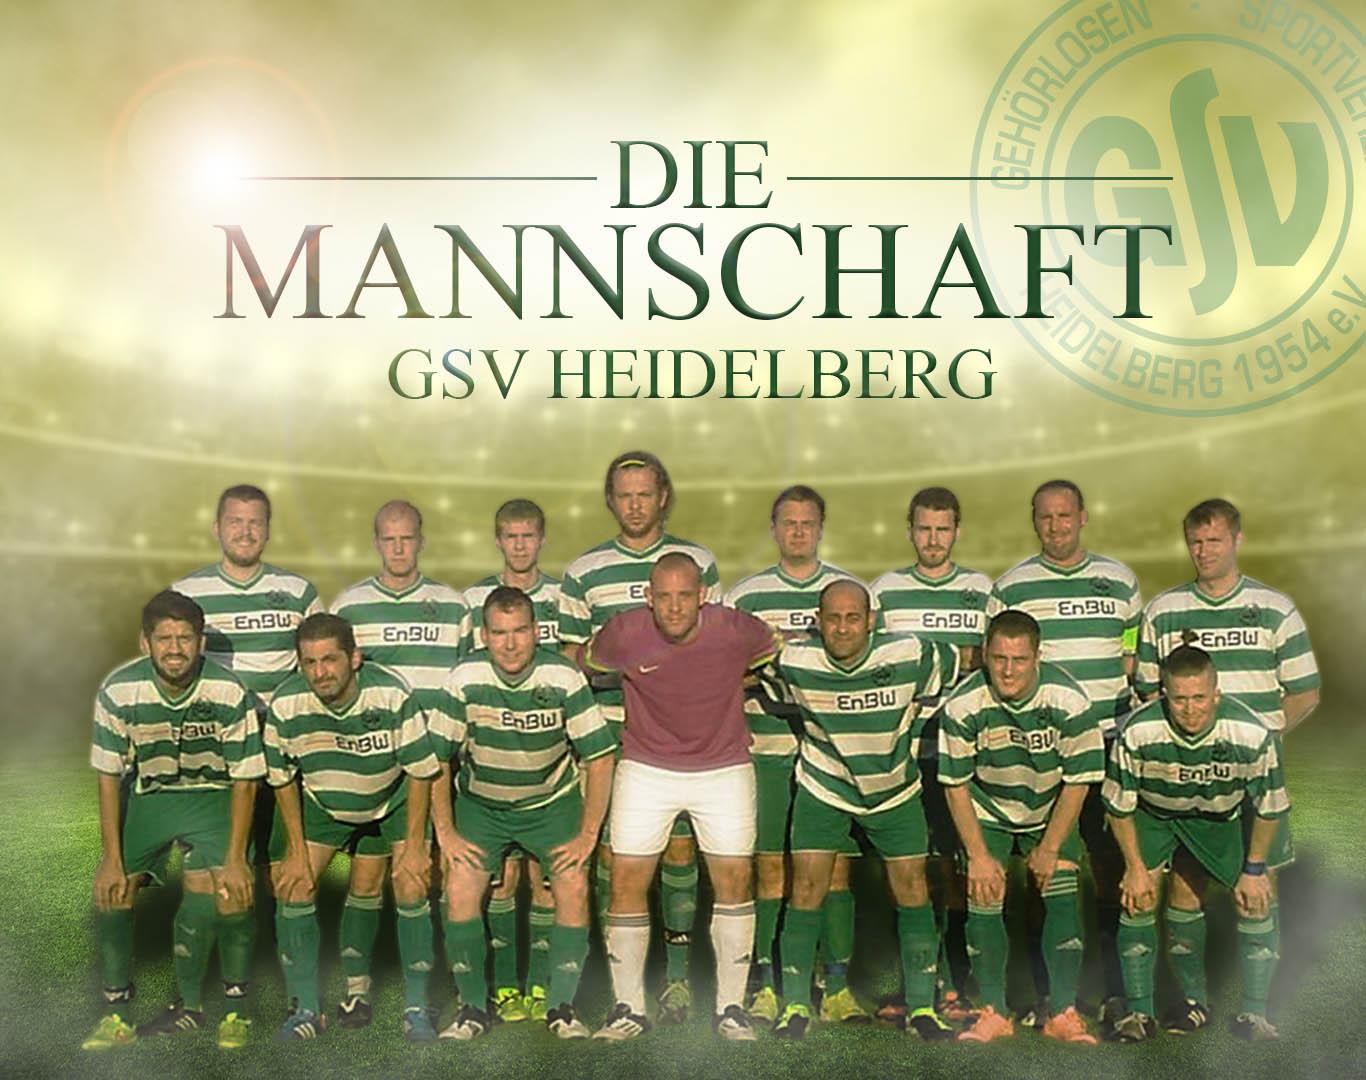 GSV Heidelberg_Mannschaft